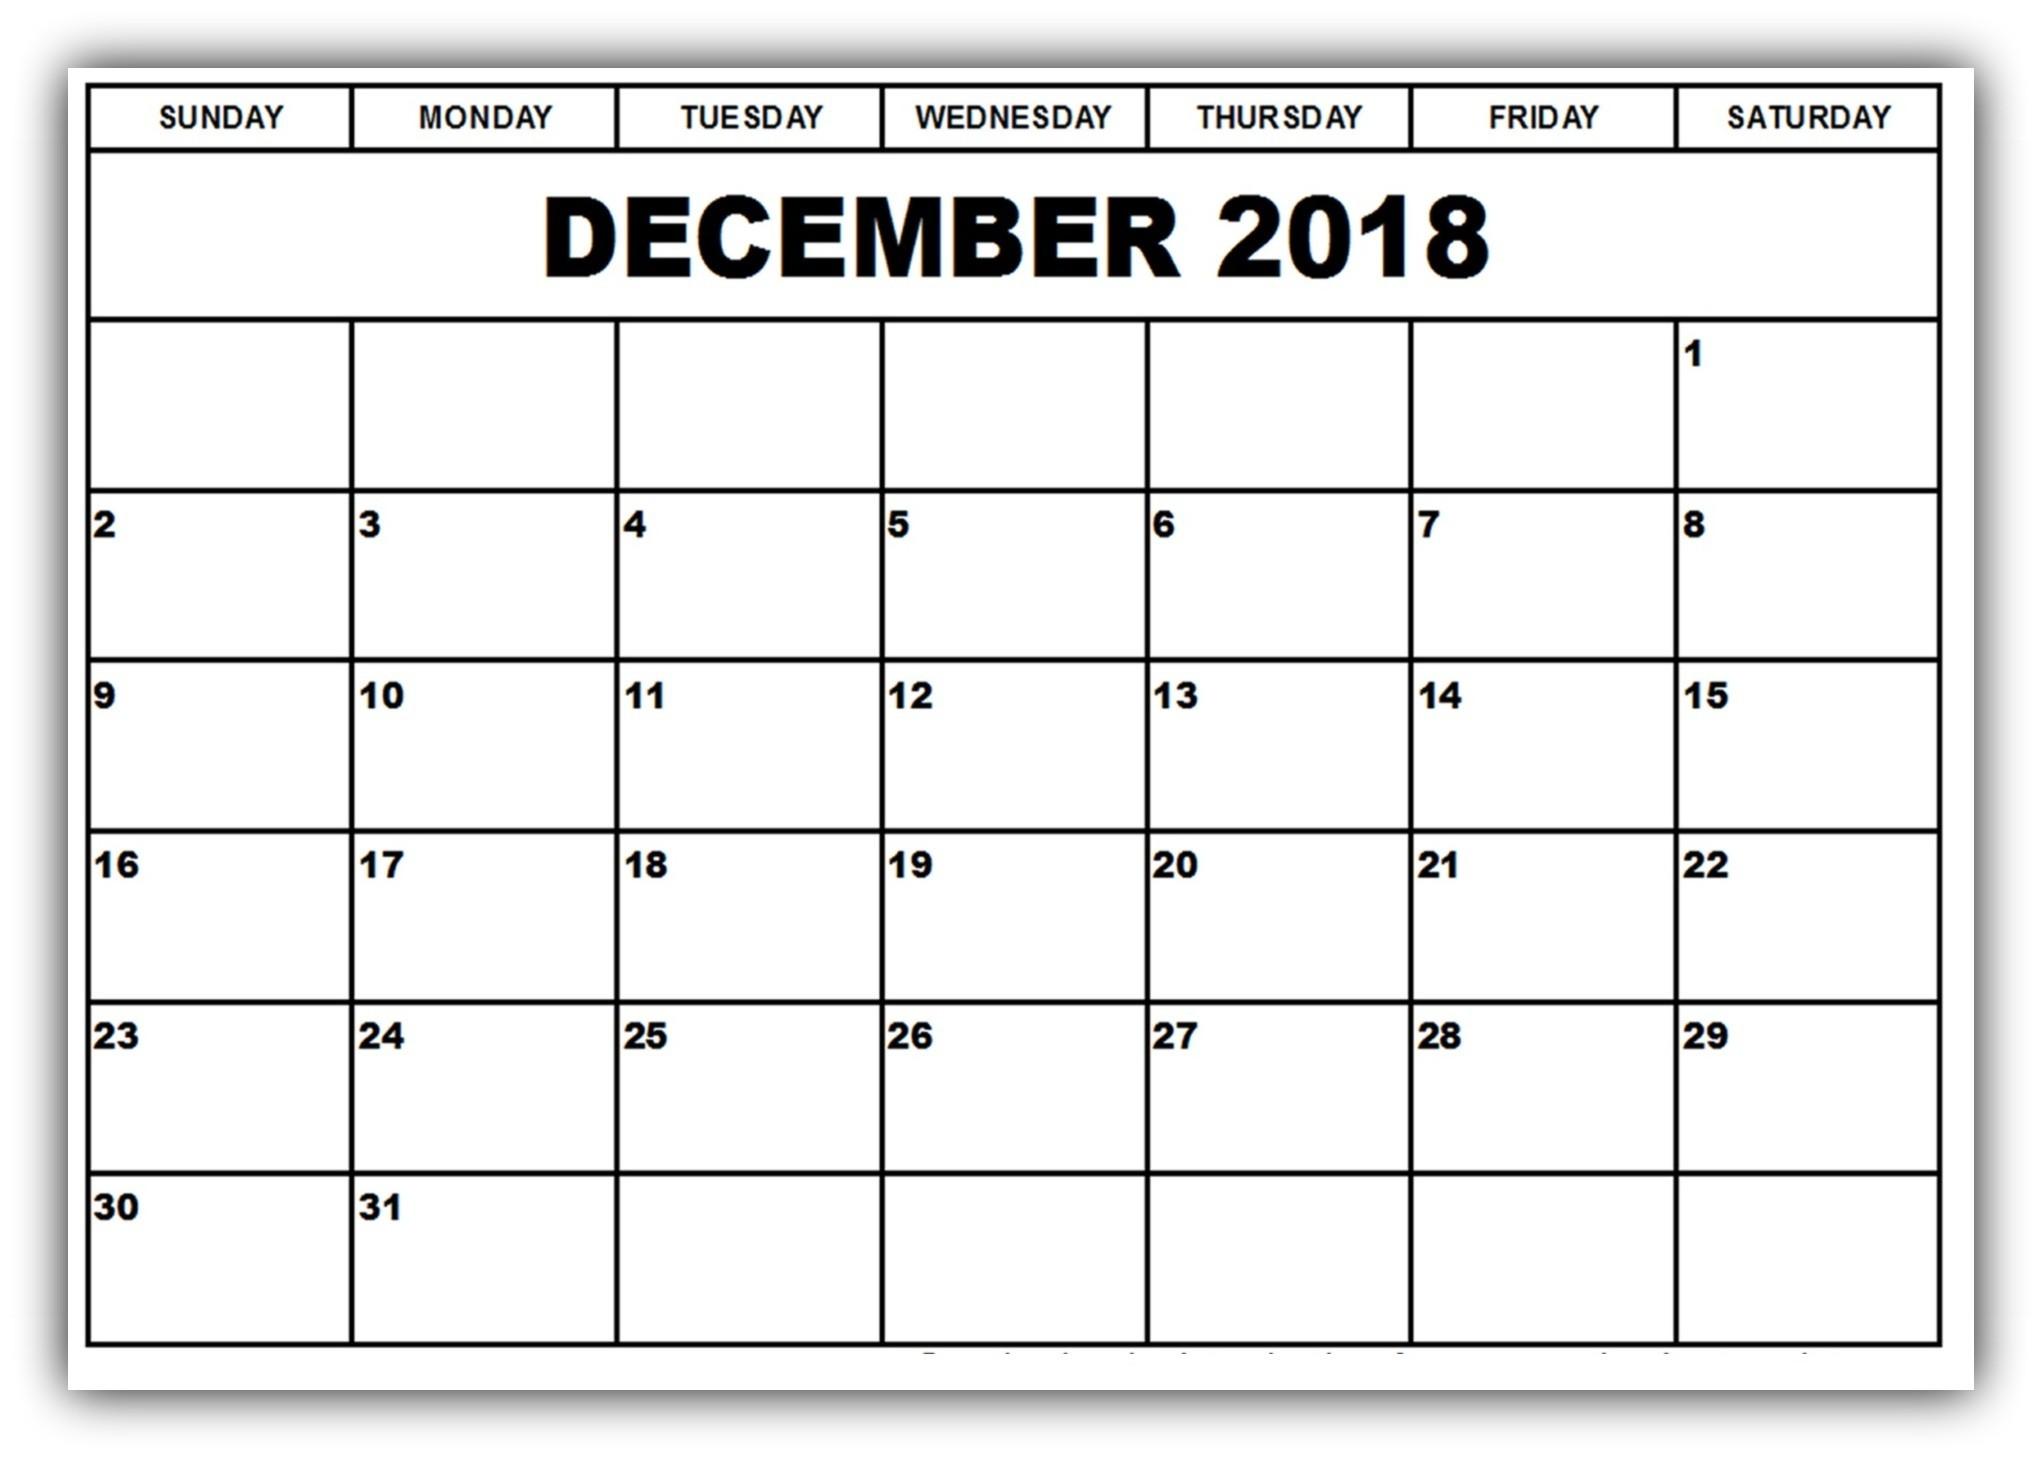 december 2018 calendar page word excel pdf printable template